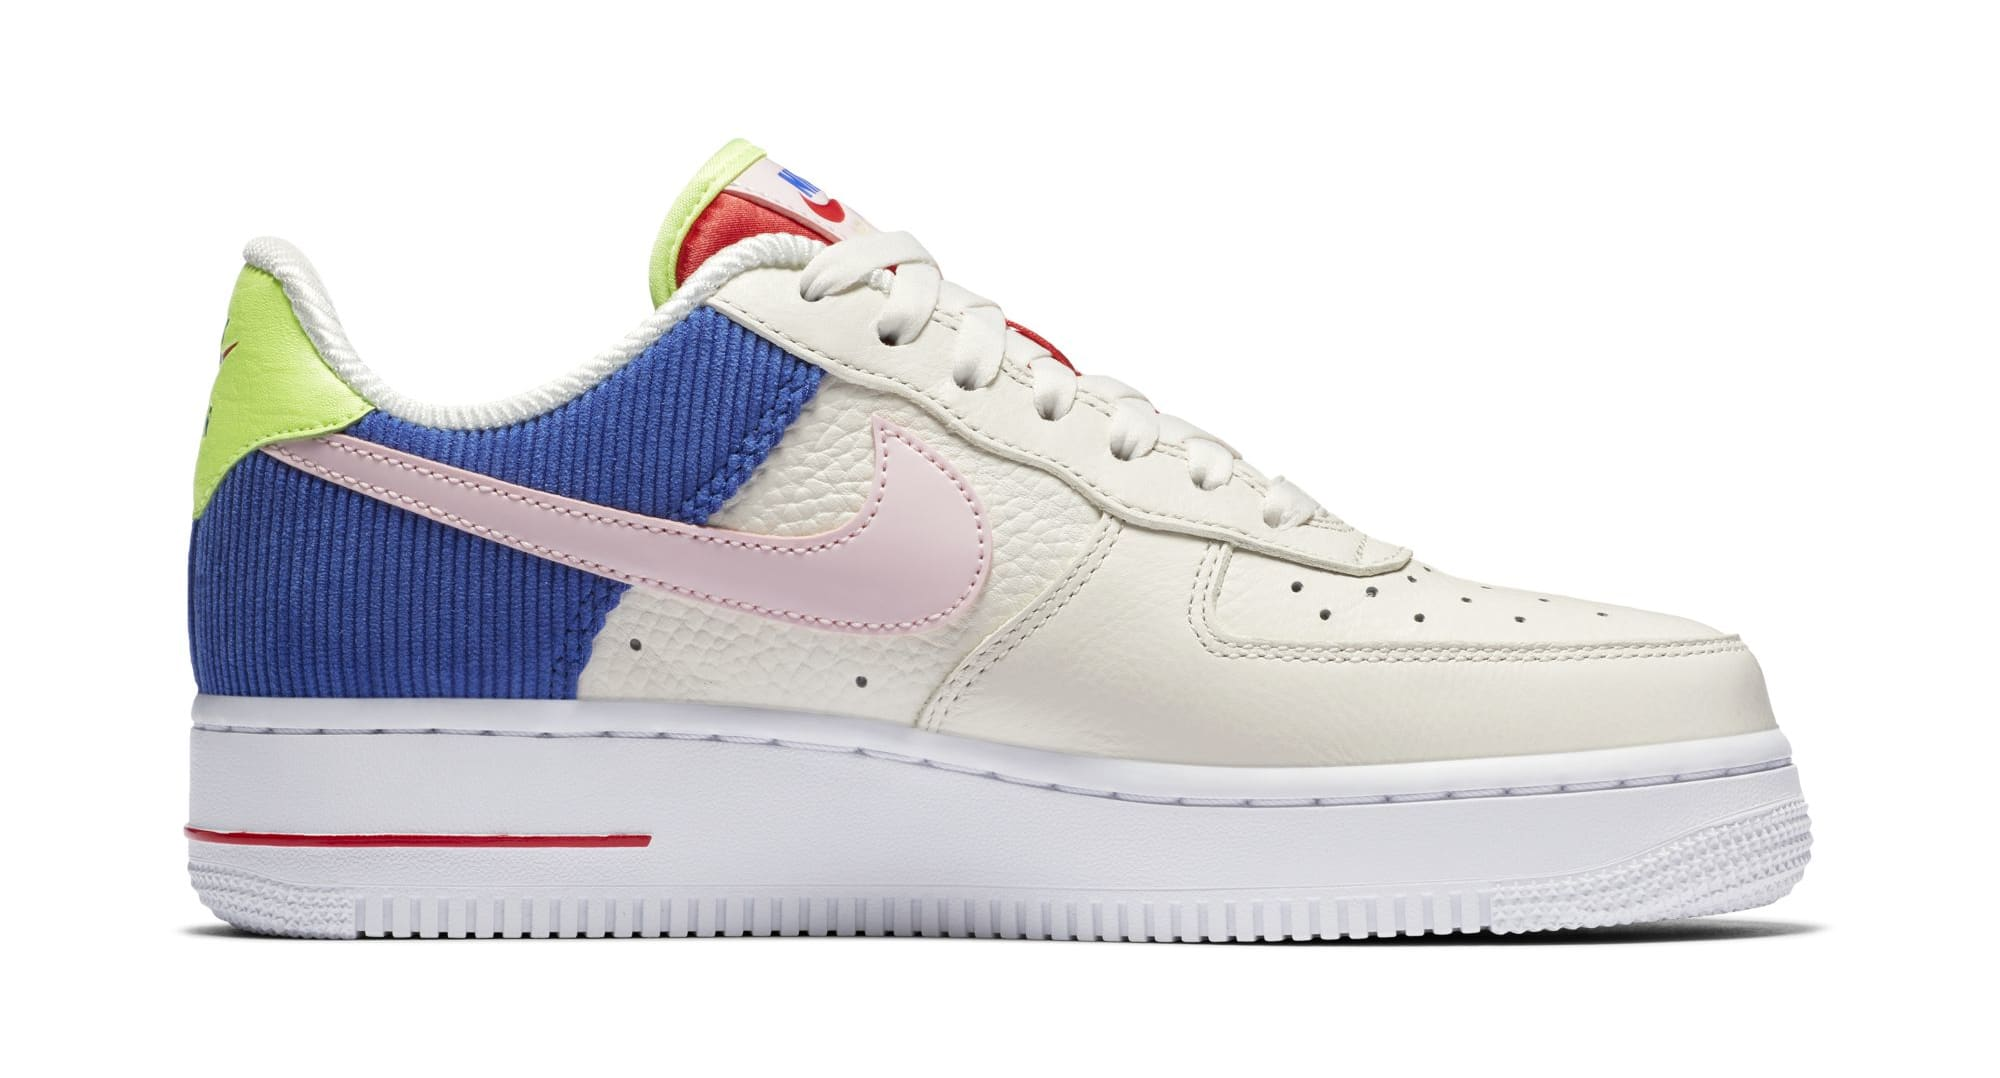 WMNS Nike Air Force 1 Panache (Medial)